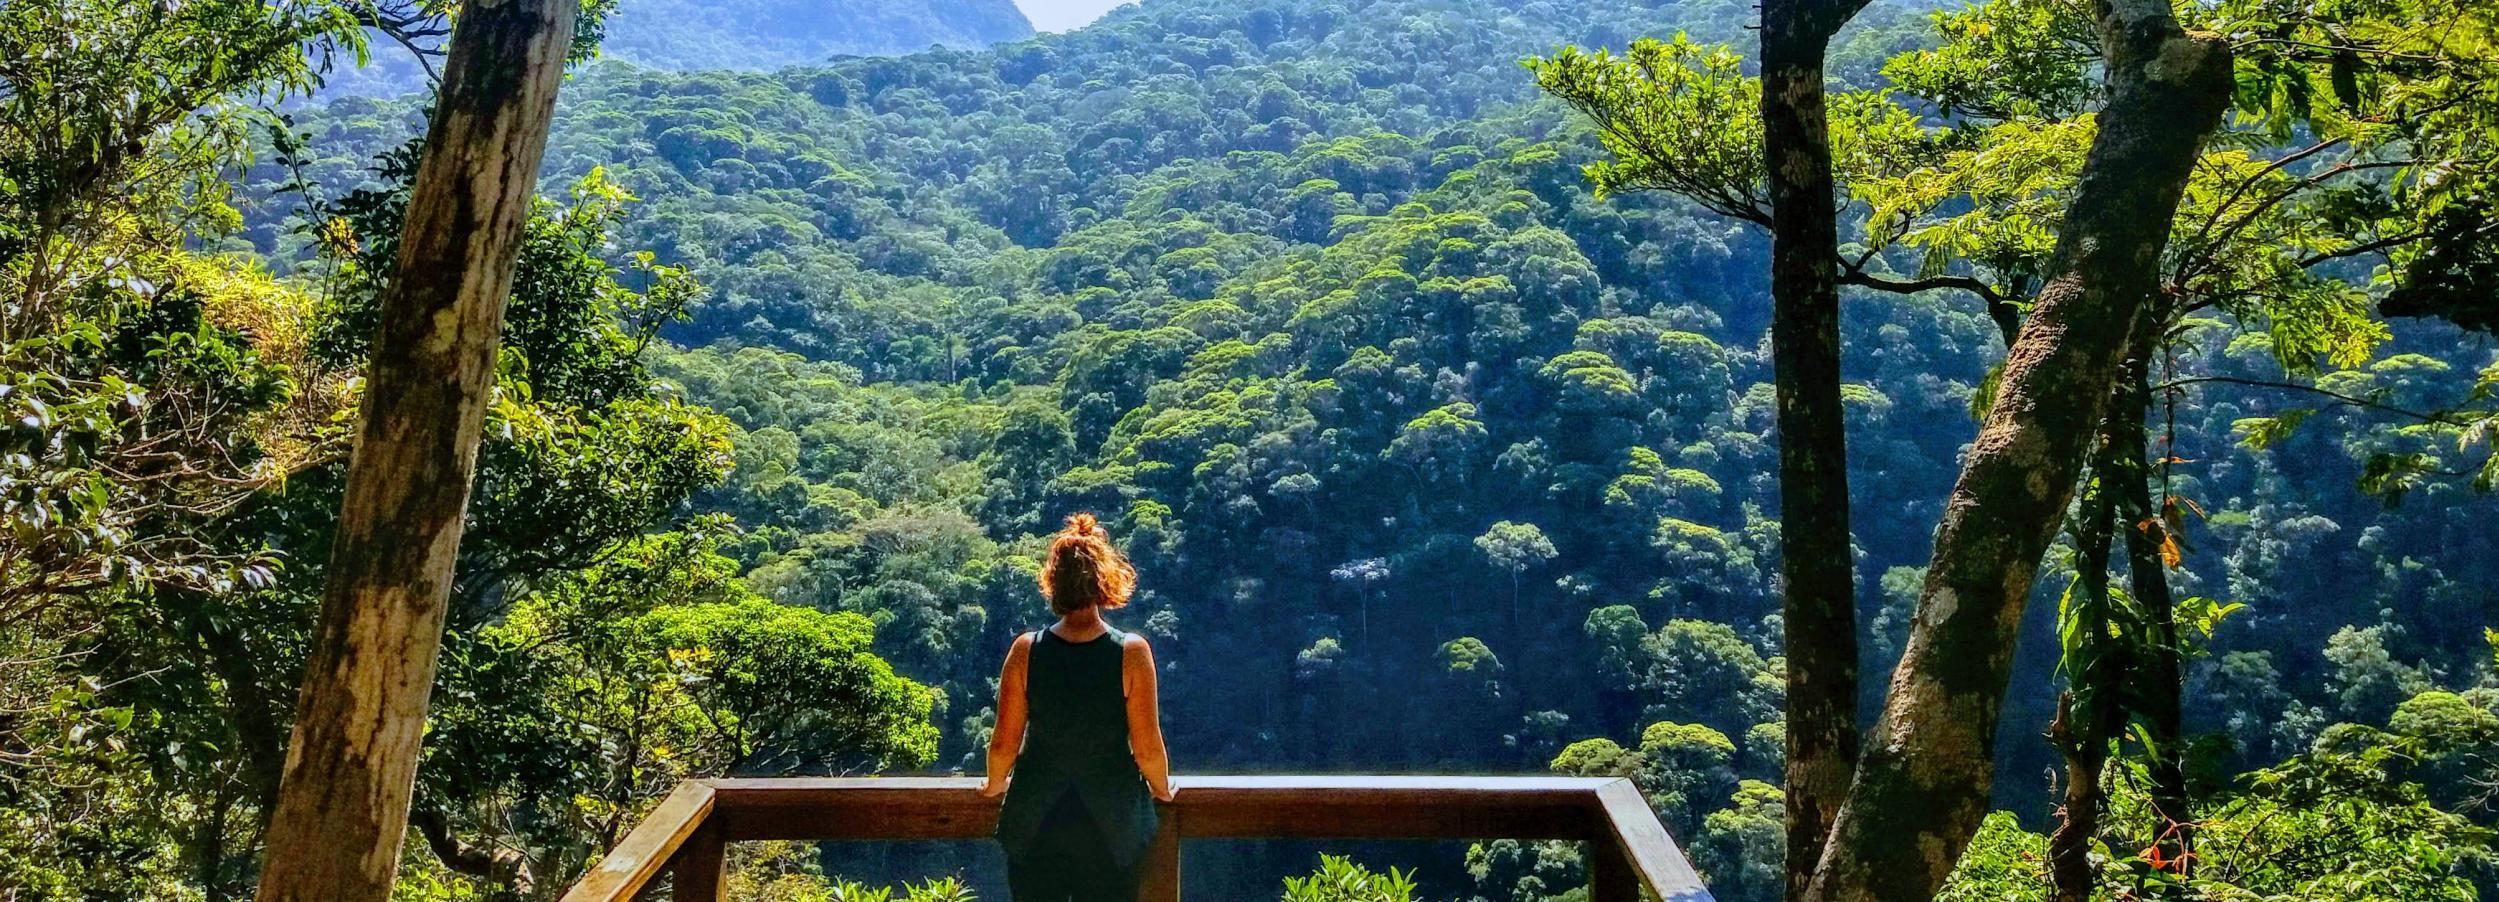 Bosque de la Tijuca: tour familiar guiado en grupo reducido